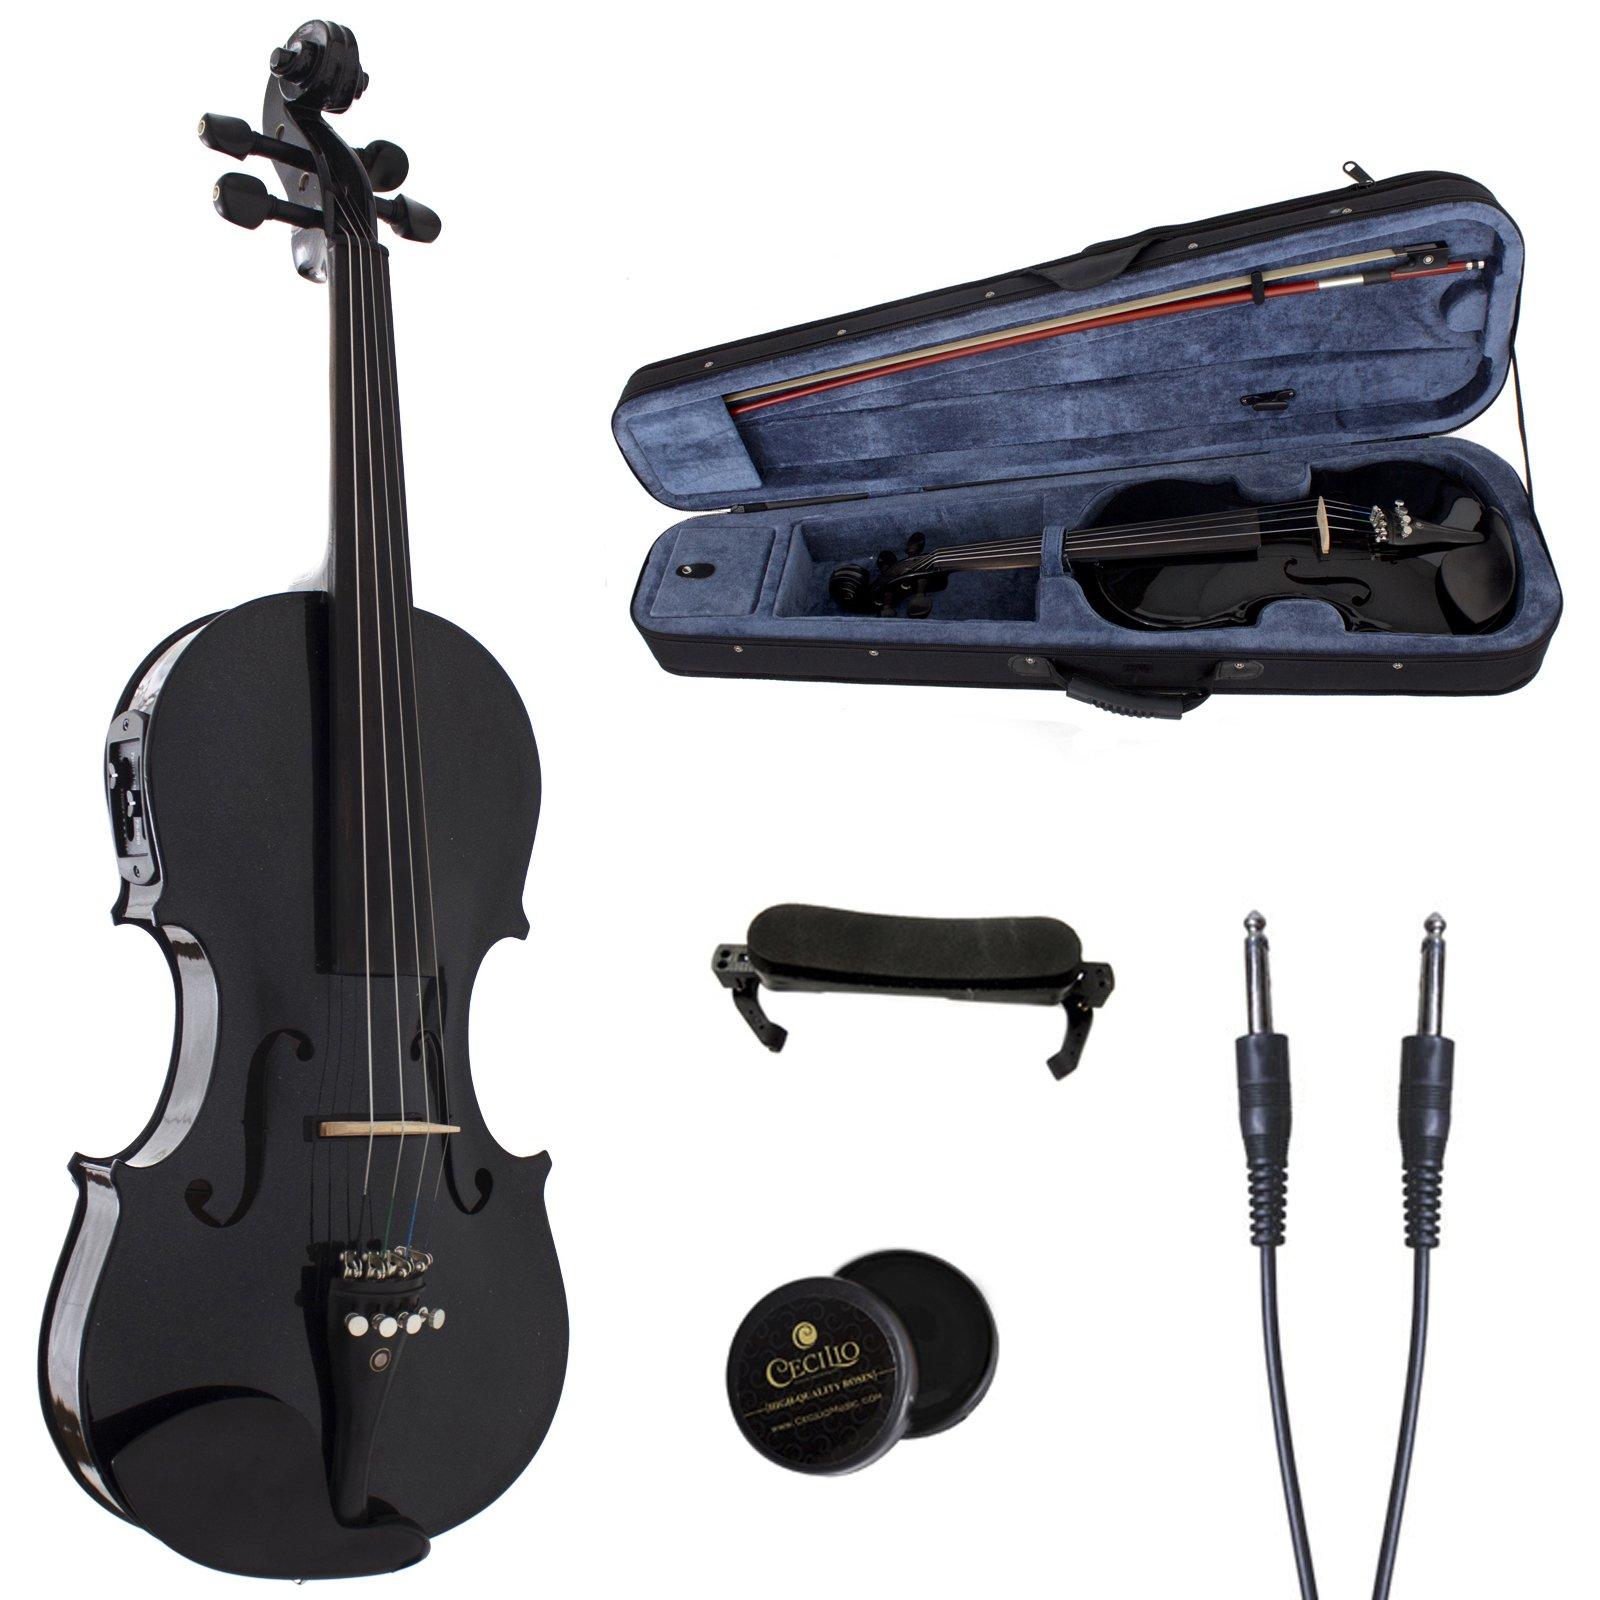 Cecilio 4/4 CVNAE-Black+SR Ebony Fitted Acoustic/Electric Violin in Metallic Black by Cecilio